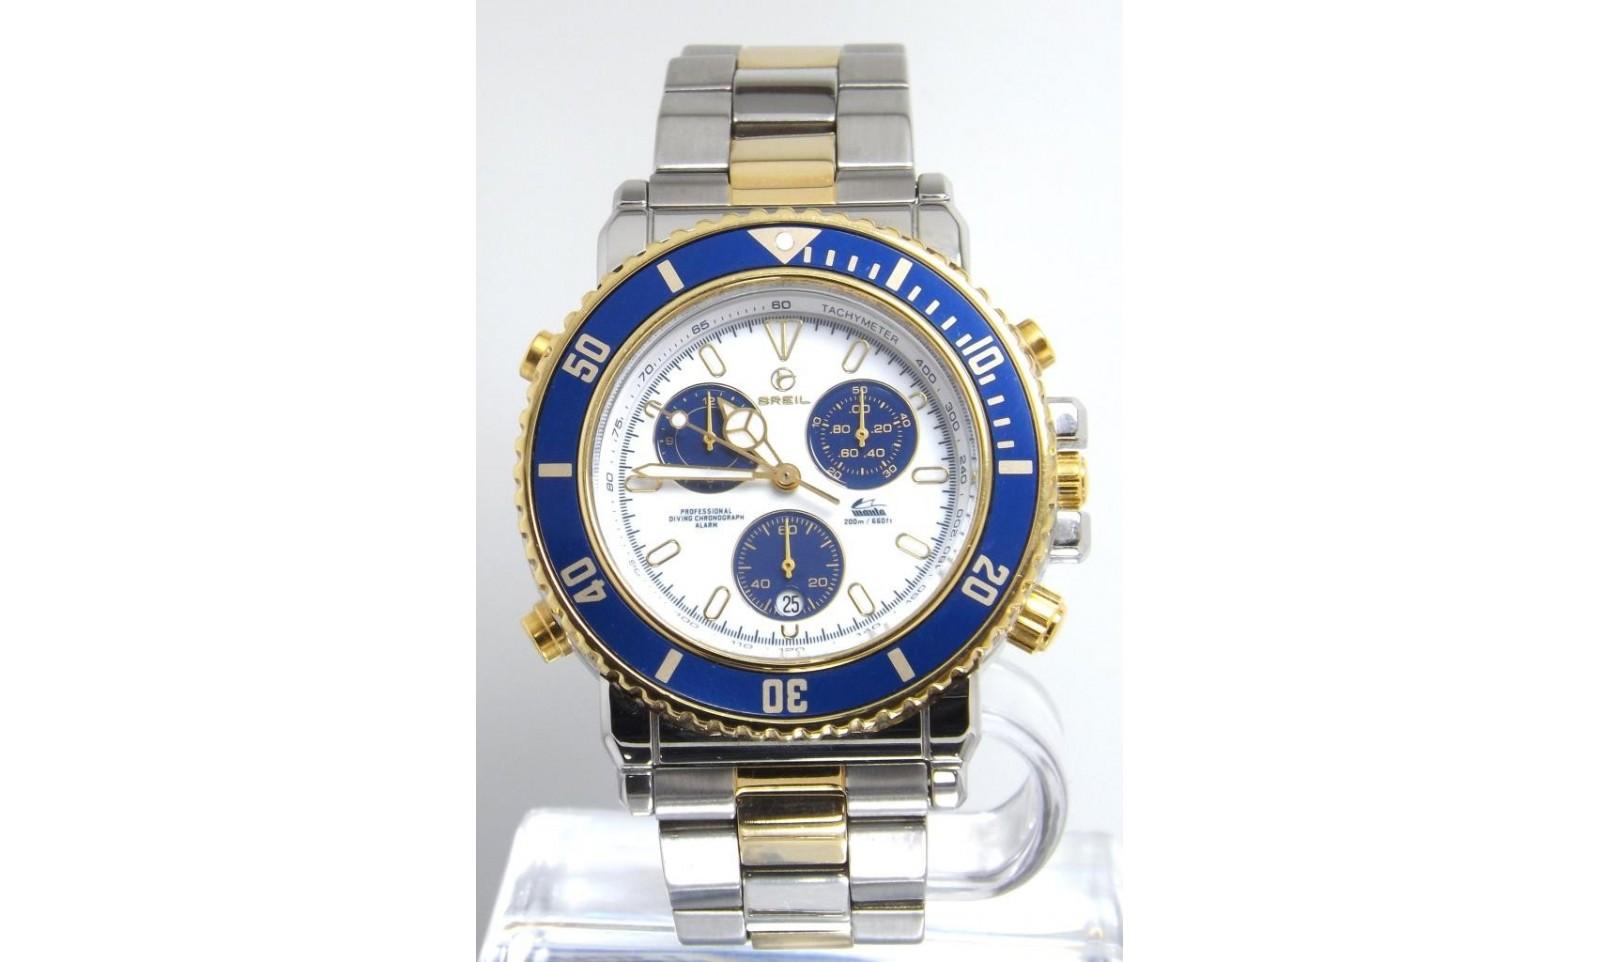 f4f6d54590828a orologio da uomo breil z960 a